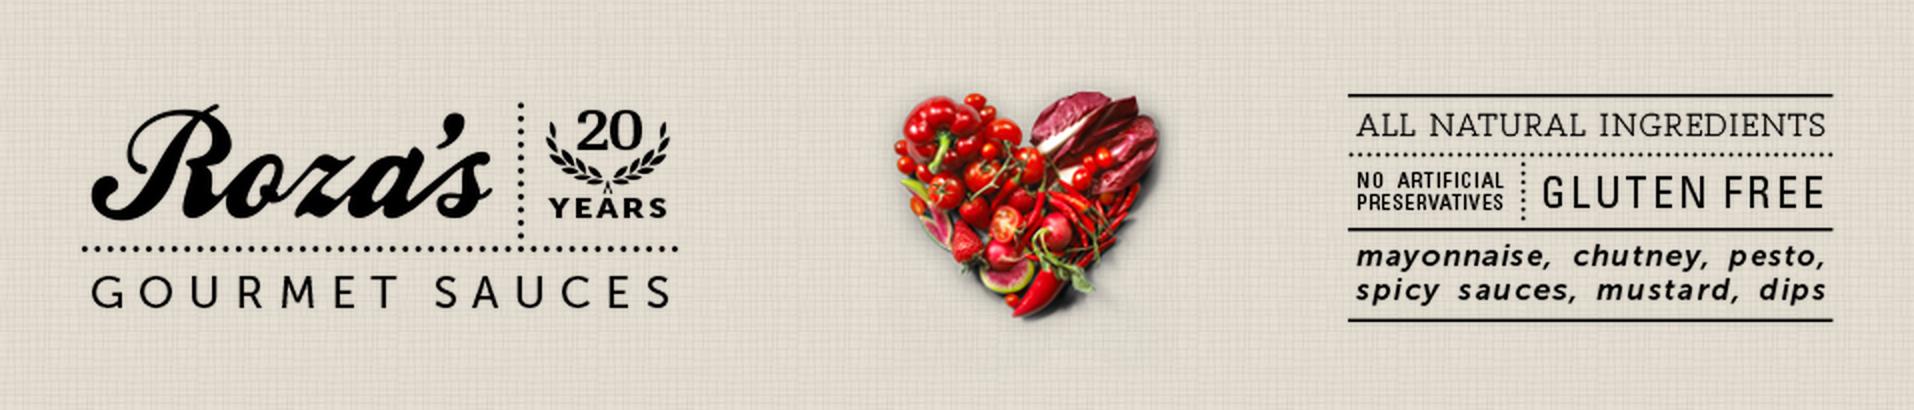 Rozas Gourmet Sauces Banner - Miss Foodie